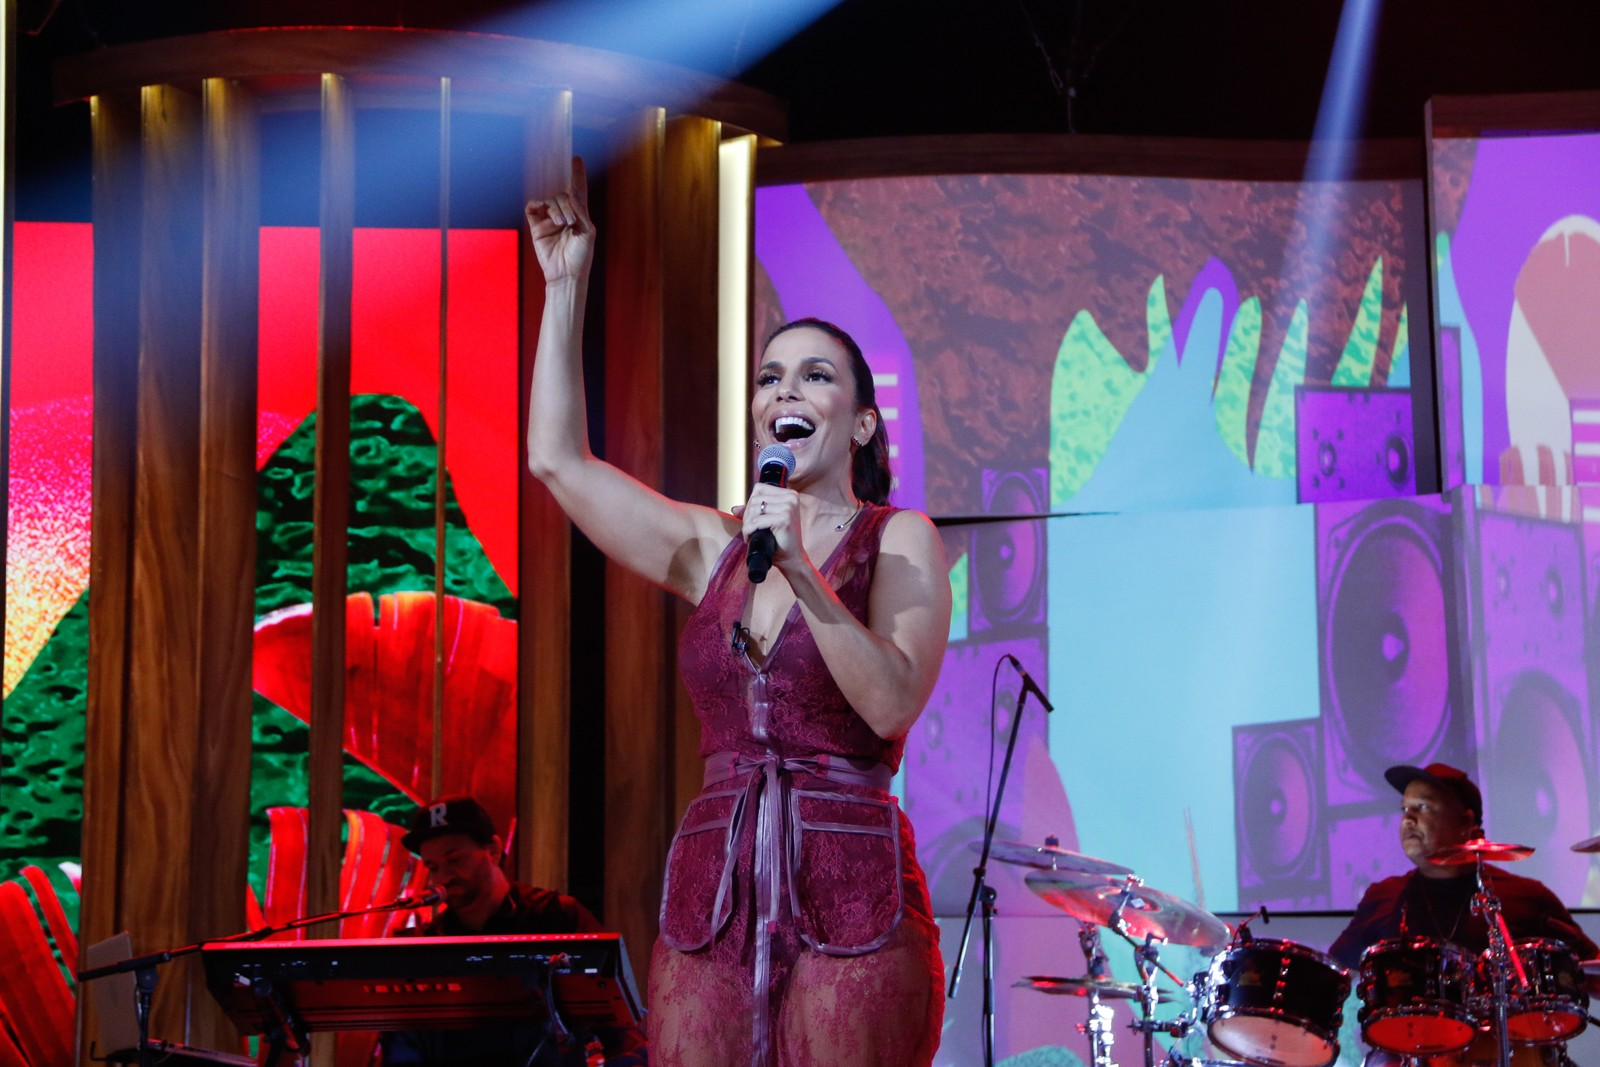 Durante entrevista, Ivete canta seus sucessos